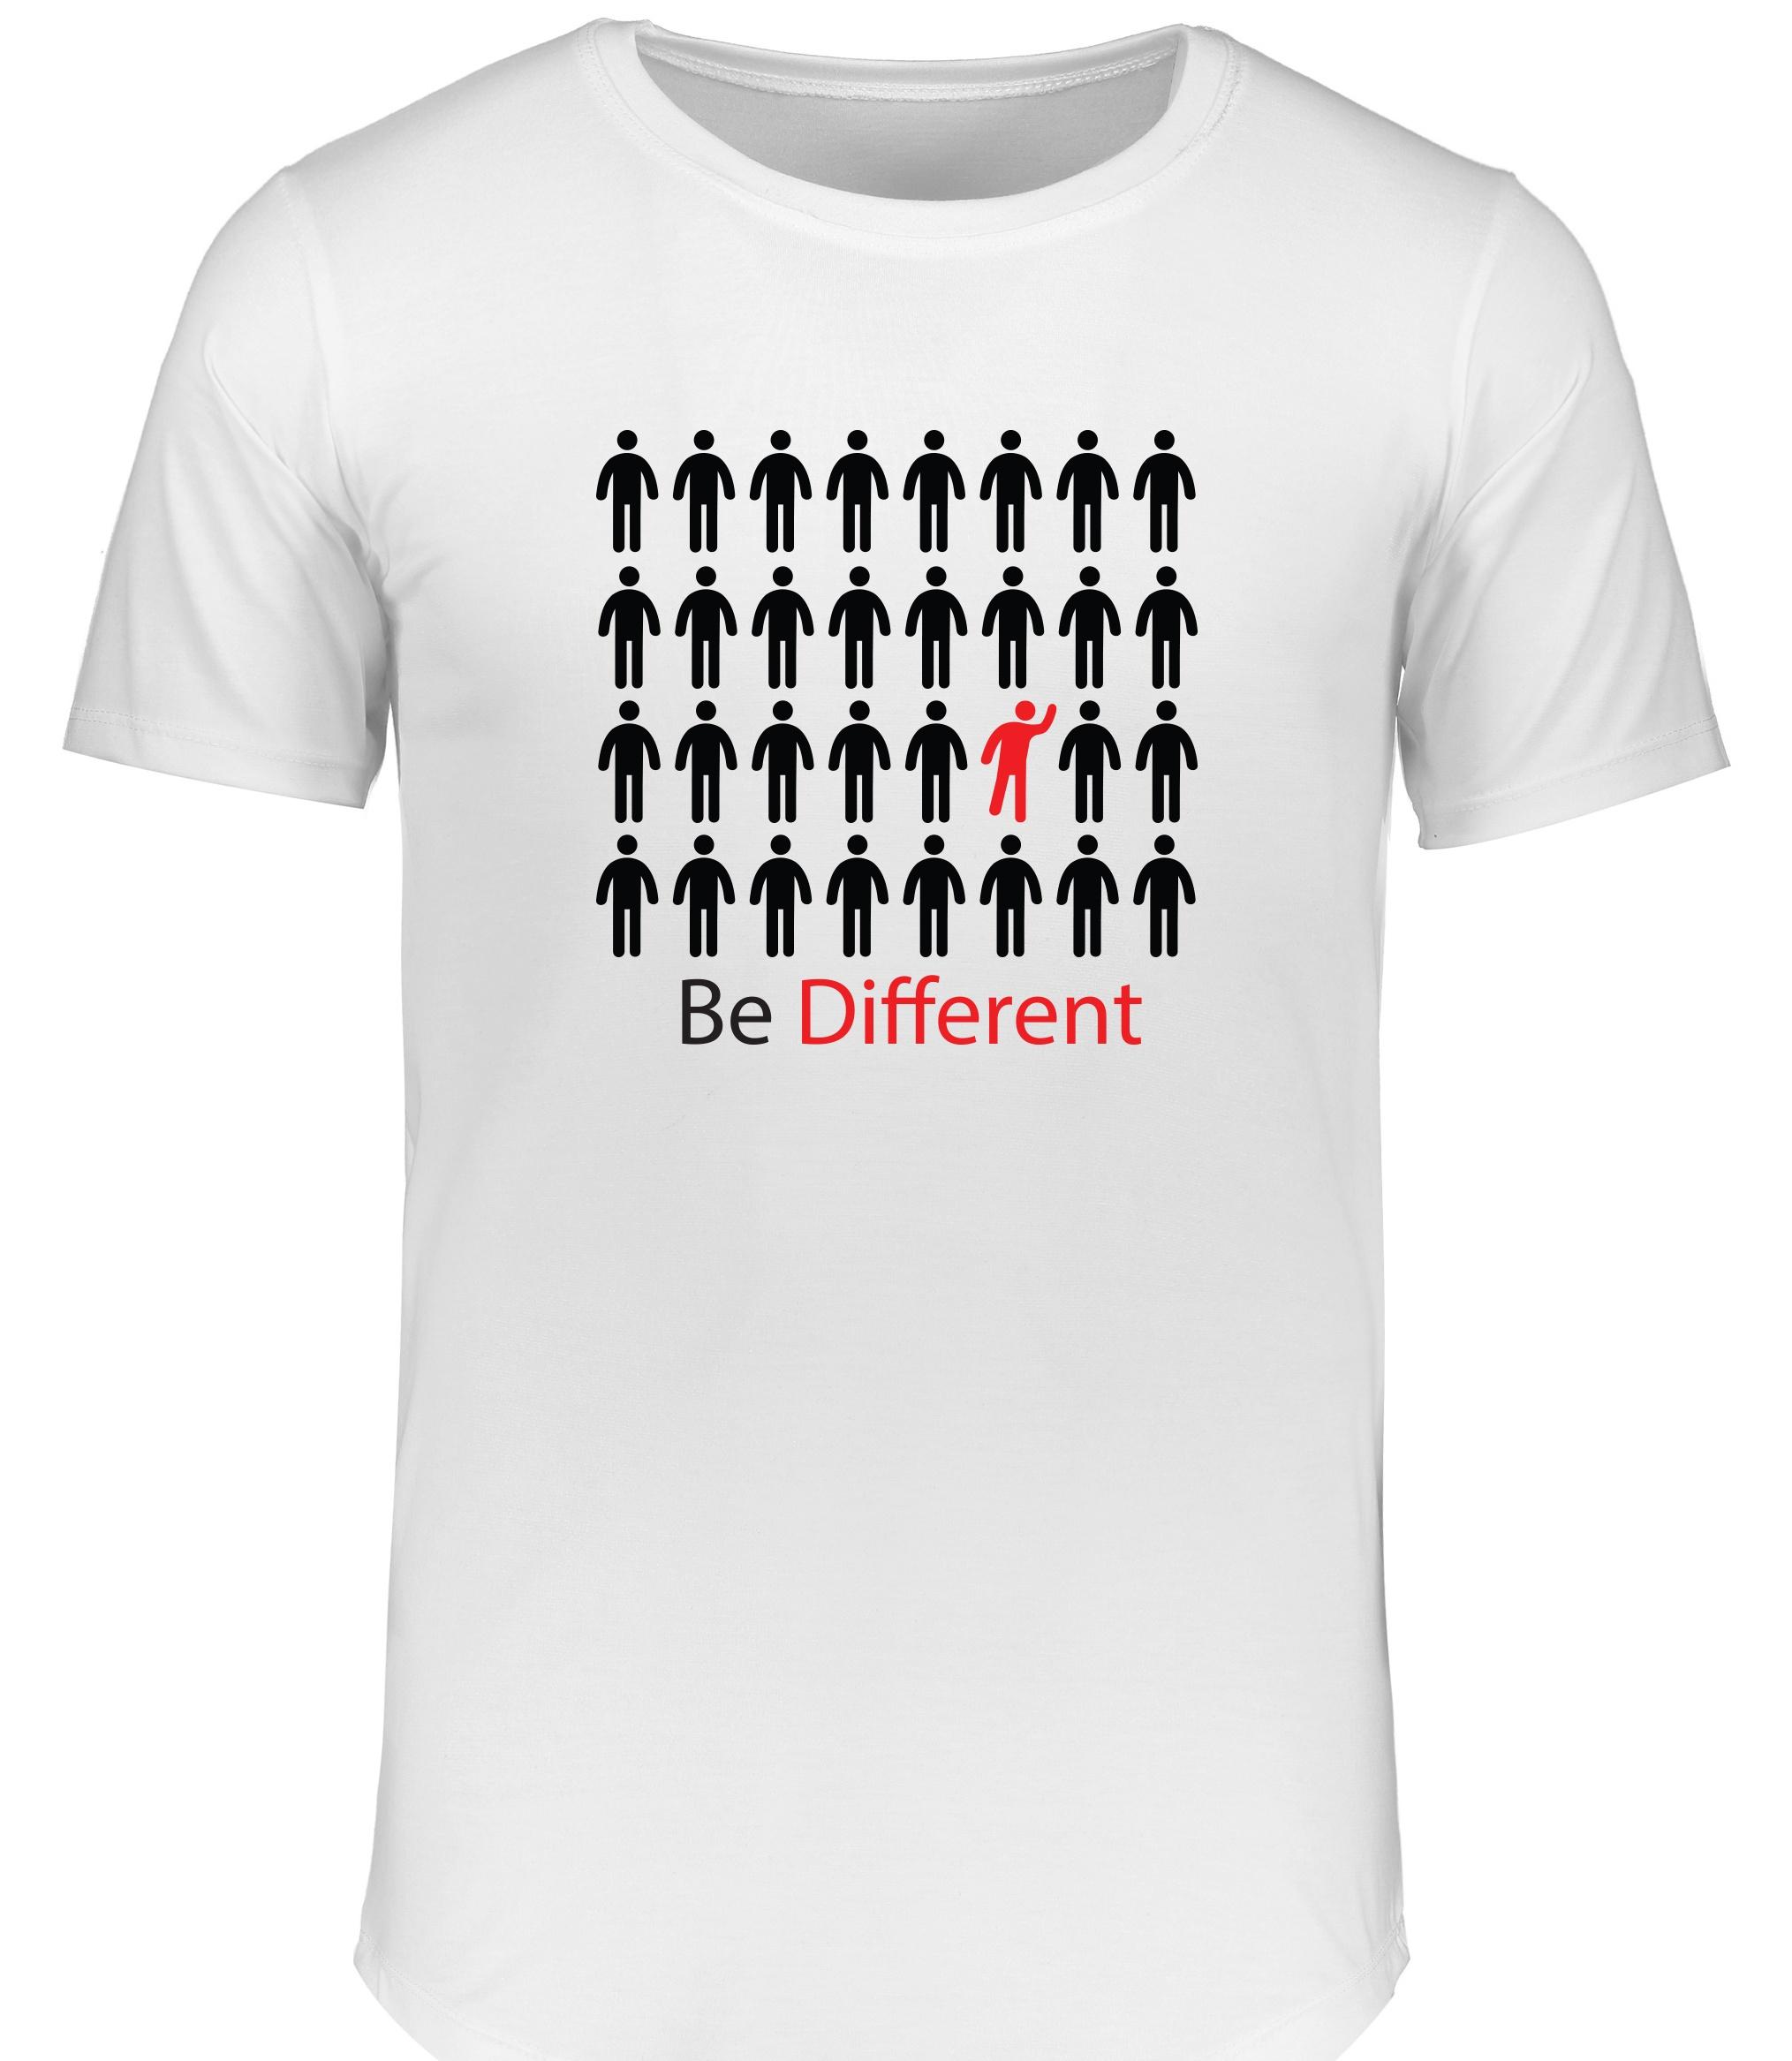 تیشرت مردانه آی برند طرح متفاوت باش کد 15986